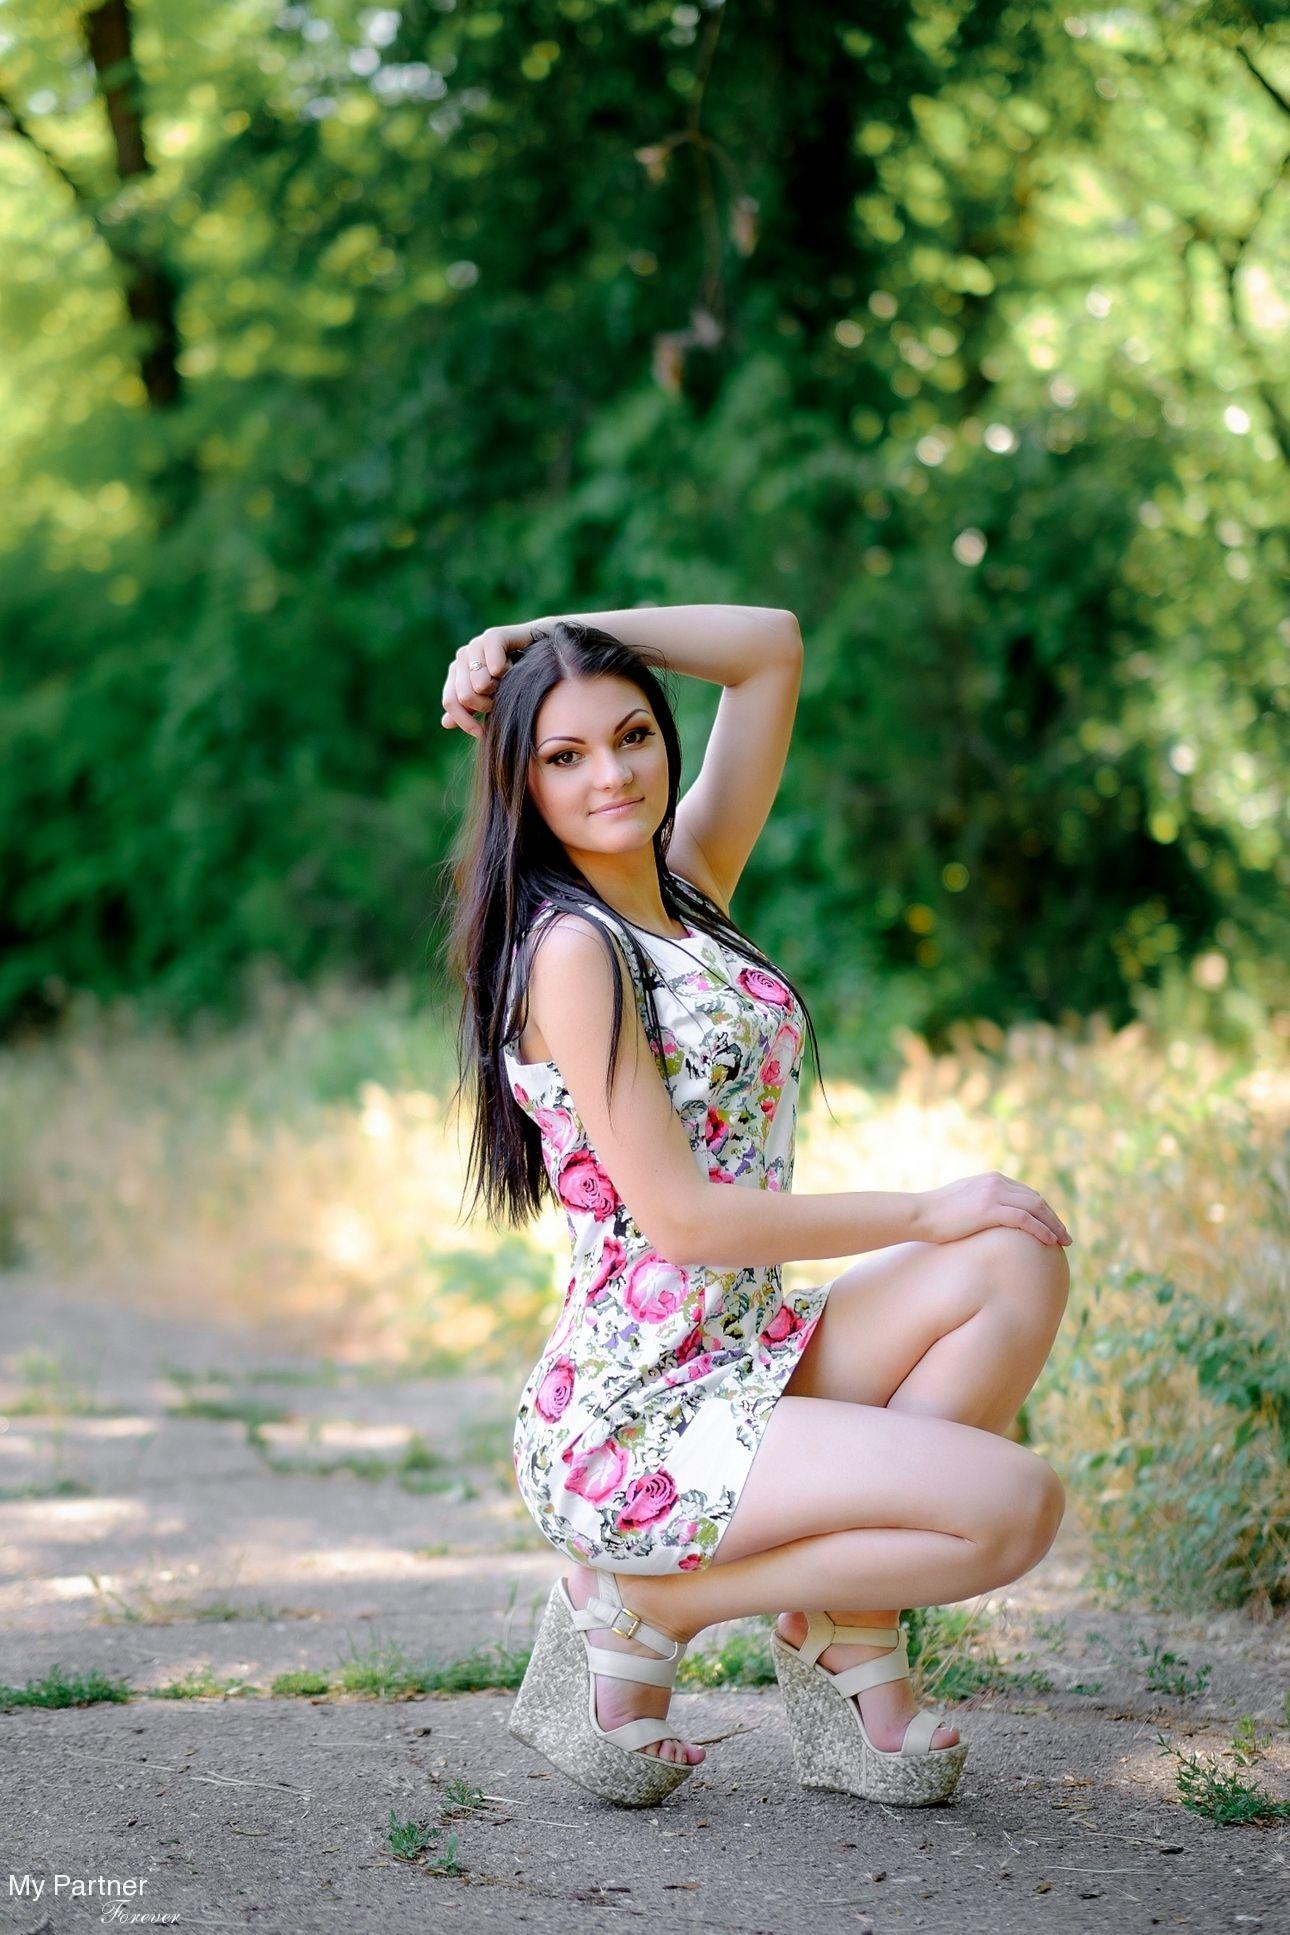 Odessa ukraine dating agentur find mig 100 gratis dating sites